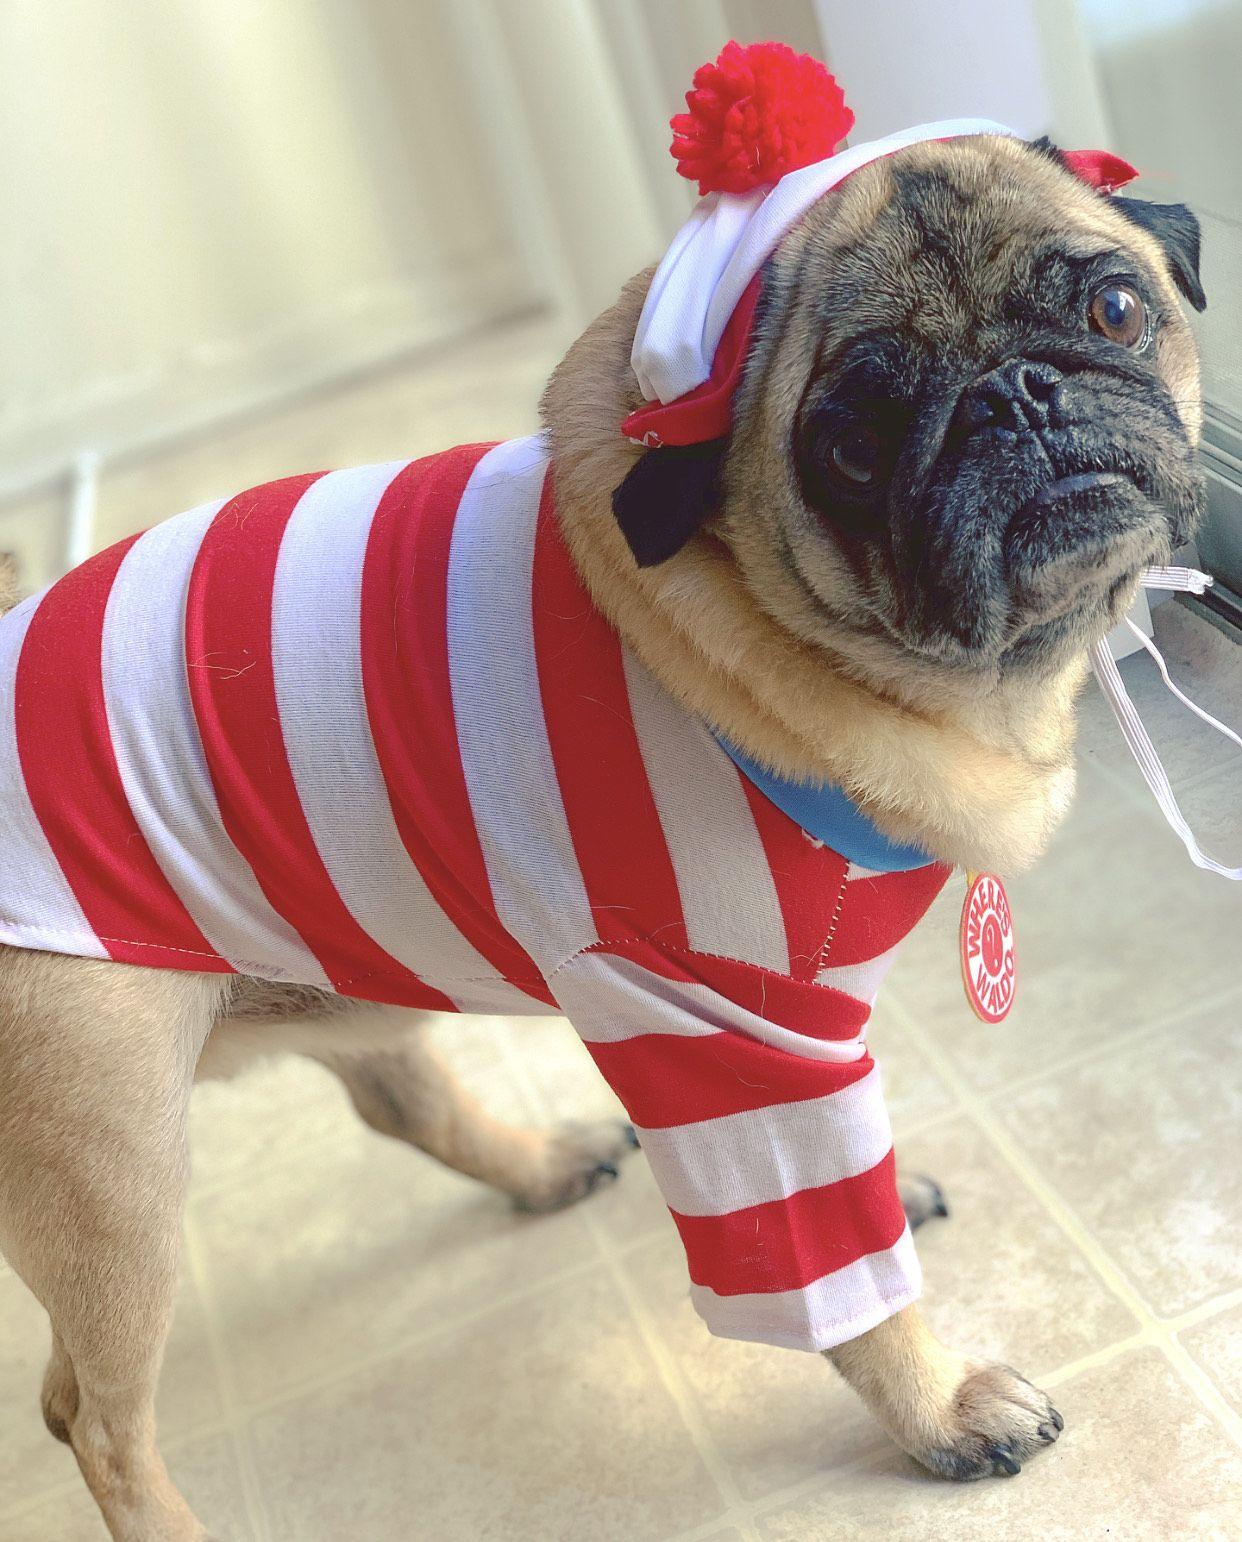 Boomer, Where's Waldo?